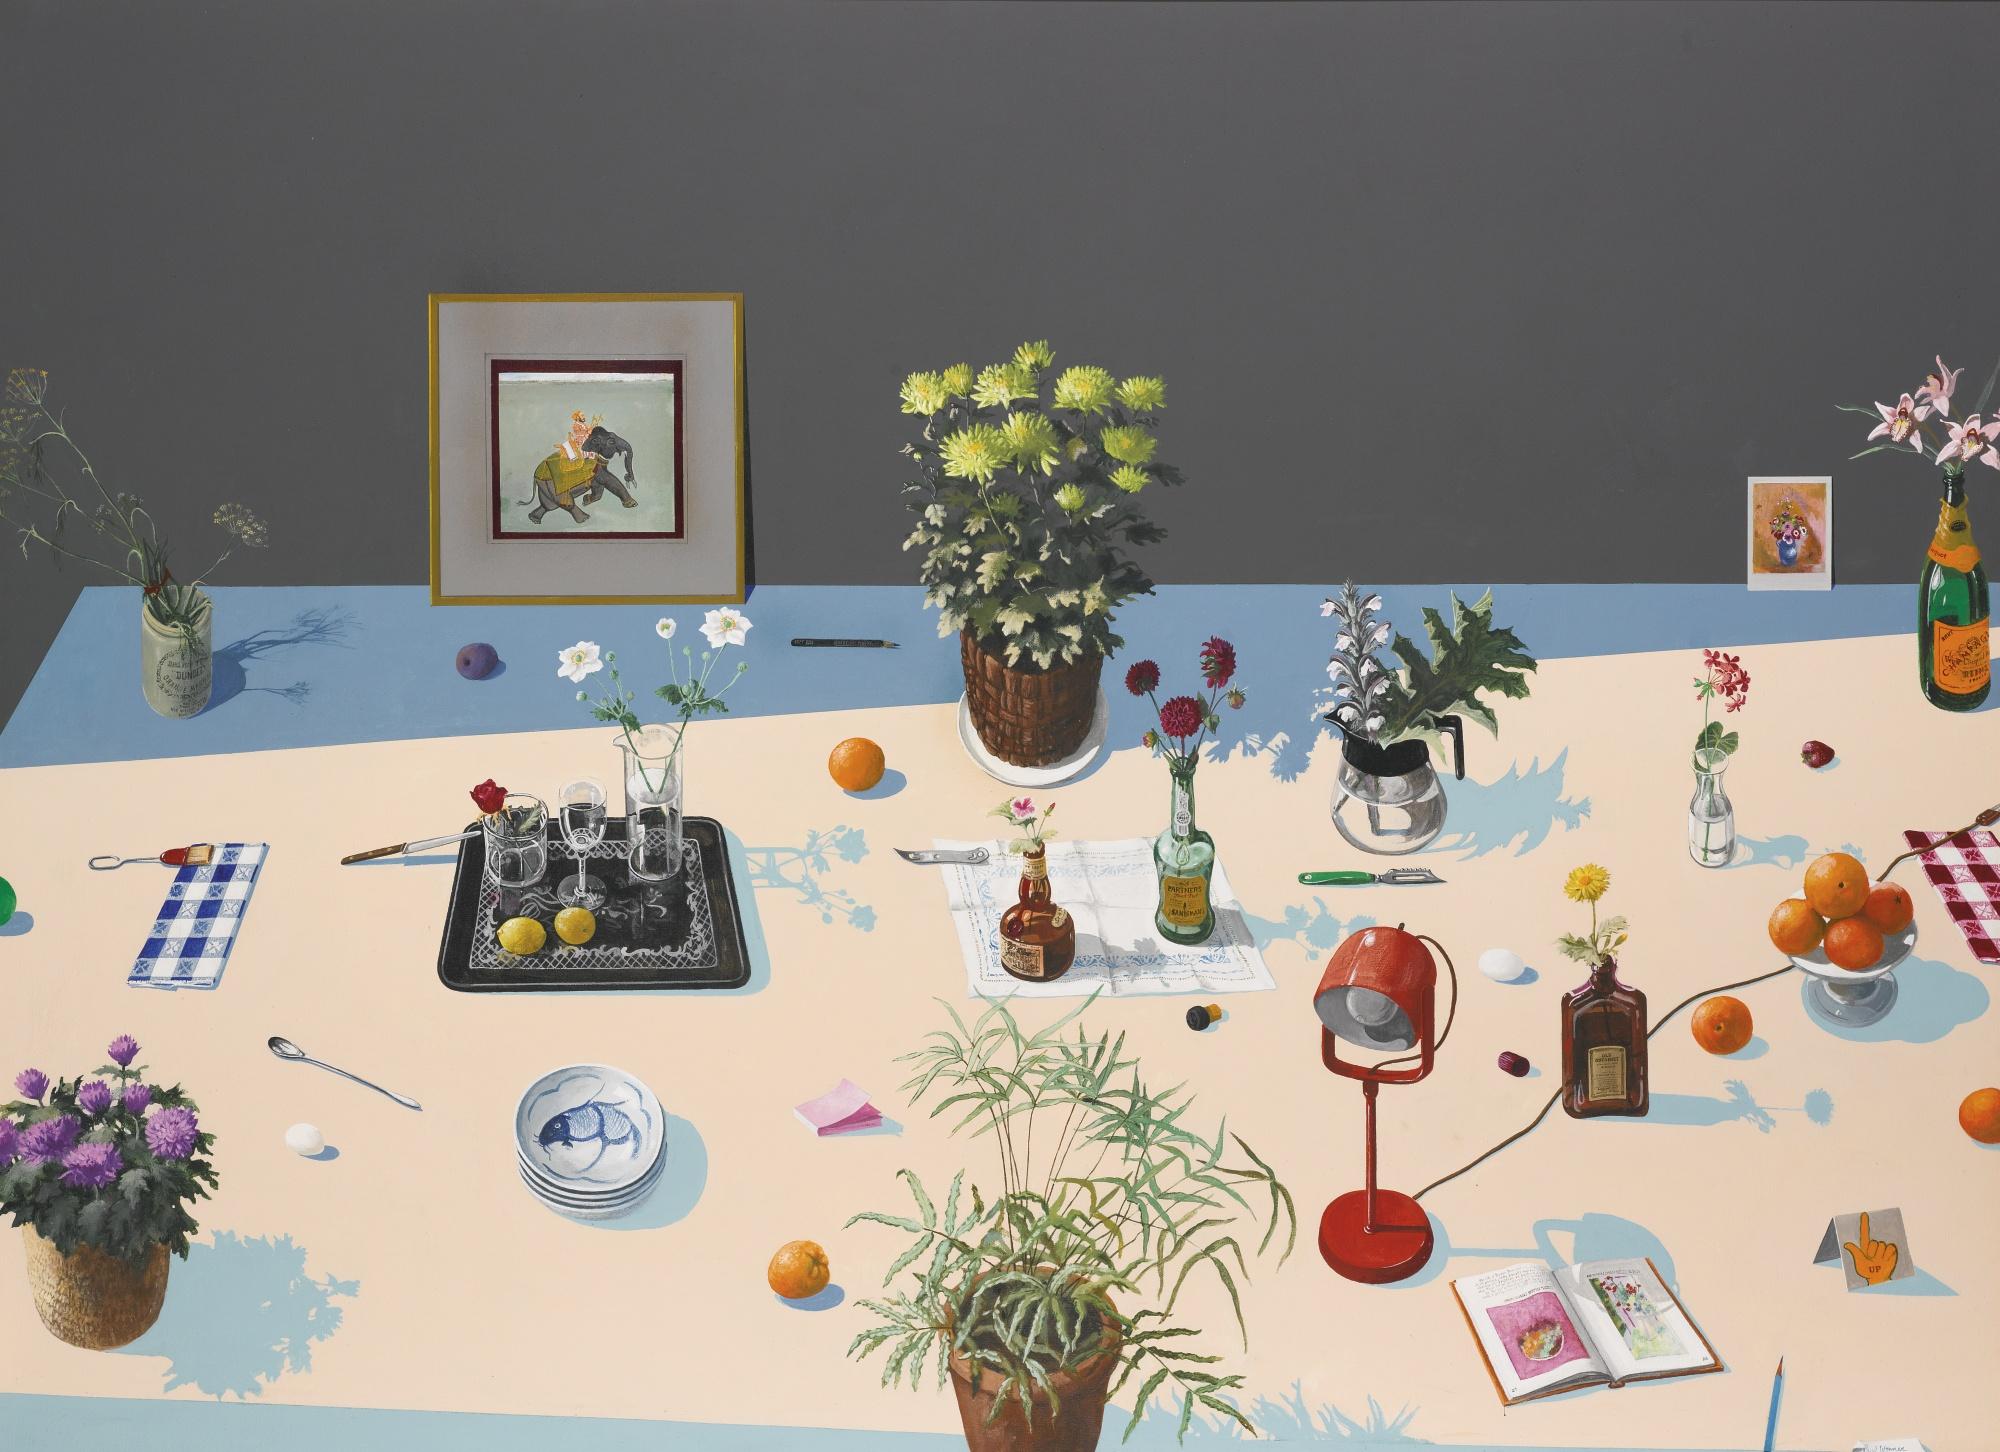 Paul Wonner   Still Life With Indian Miniature , 1980 Acrylic on canvas 177.8 x 243.8 cm